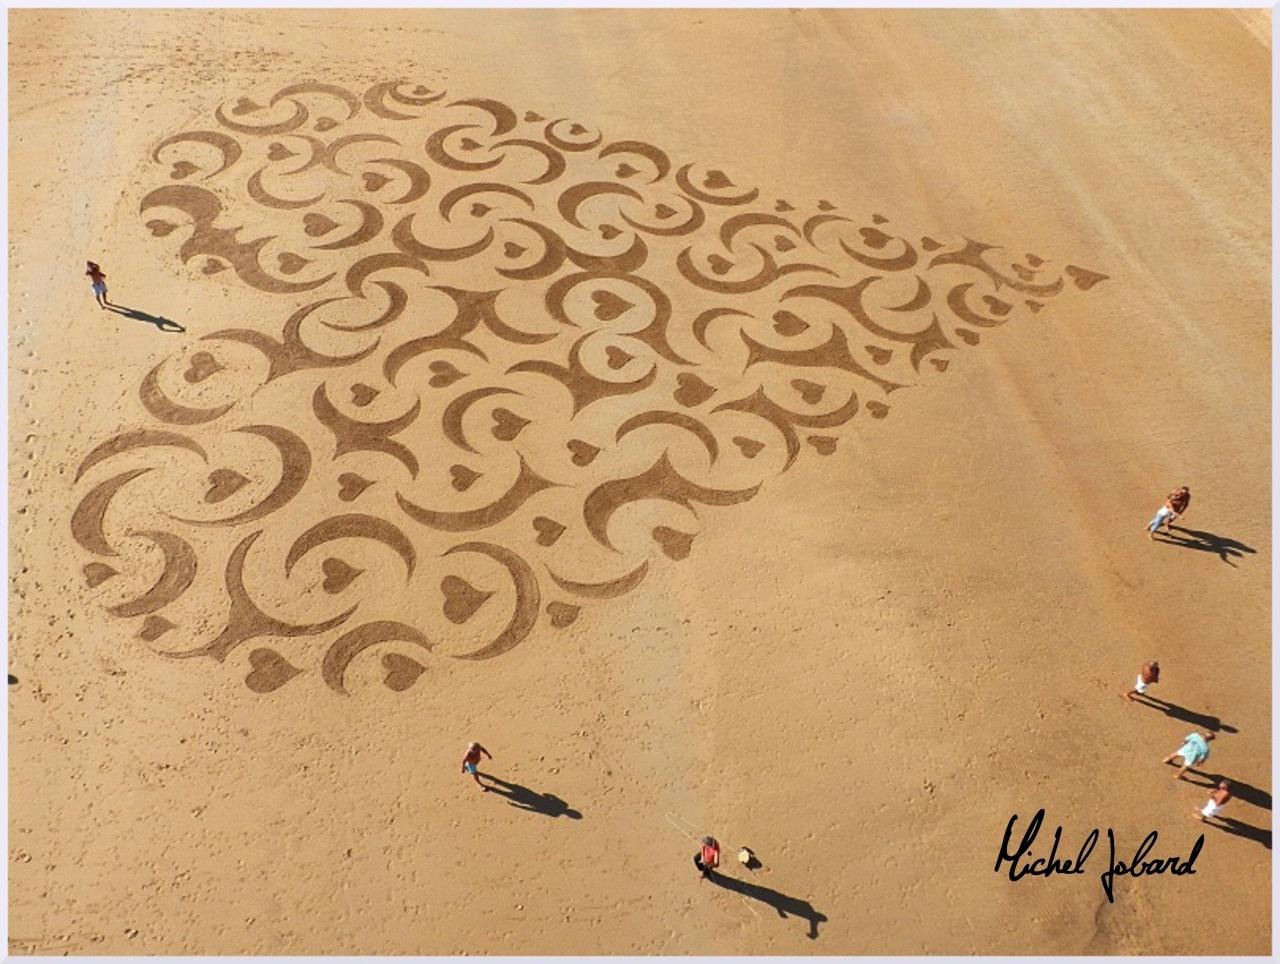 Beach-art-De-tout-coeur-07